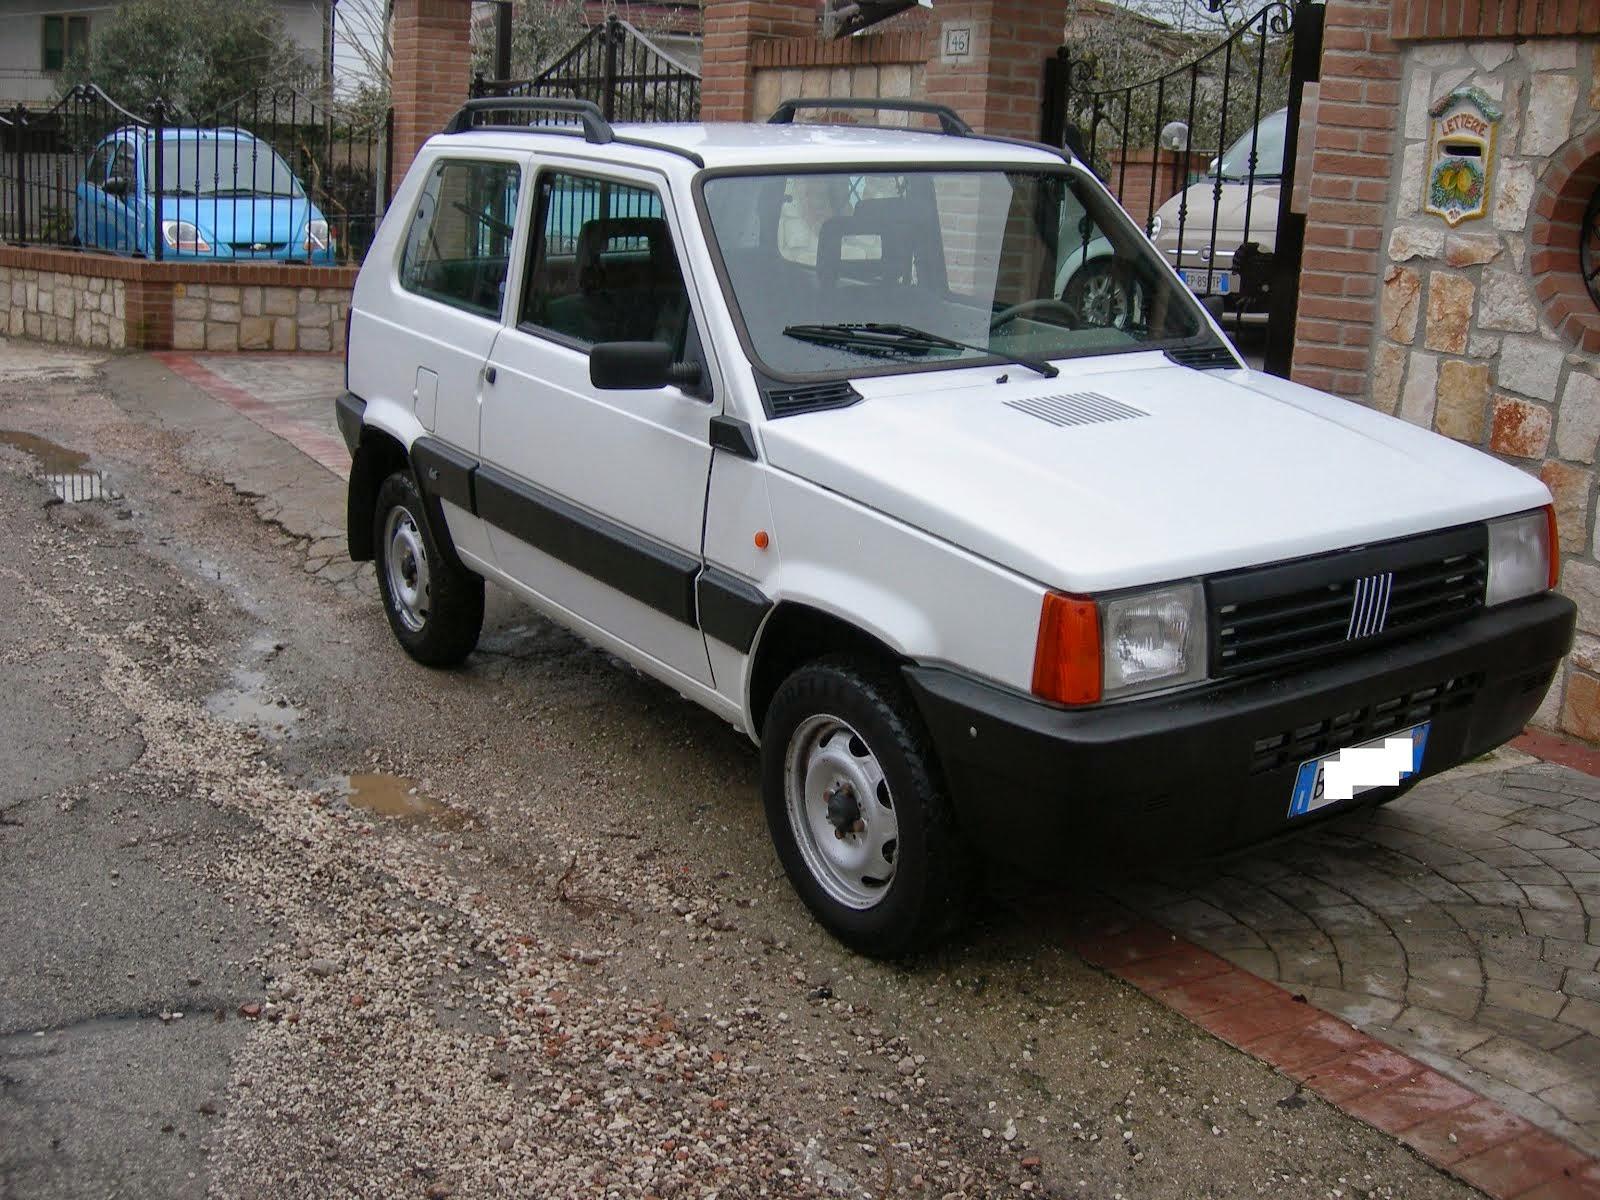 Fiat Panda 1.1 4x4 trekking 70.000 km Anno 2001